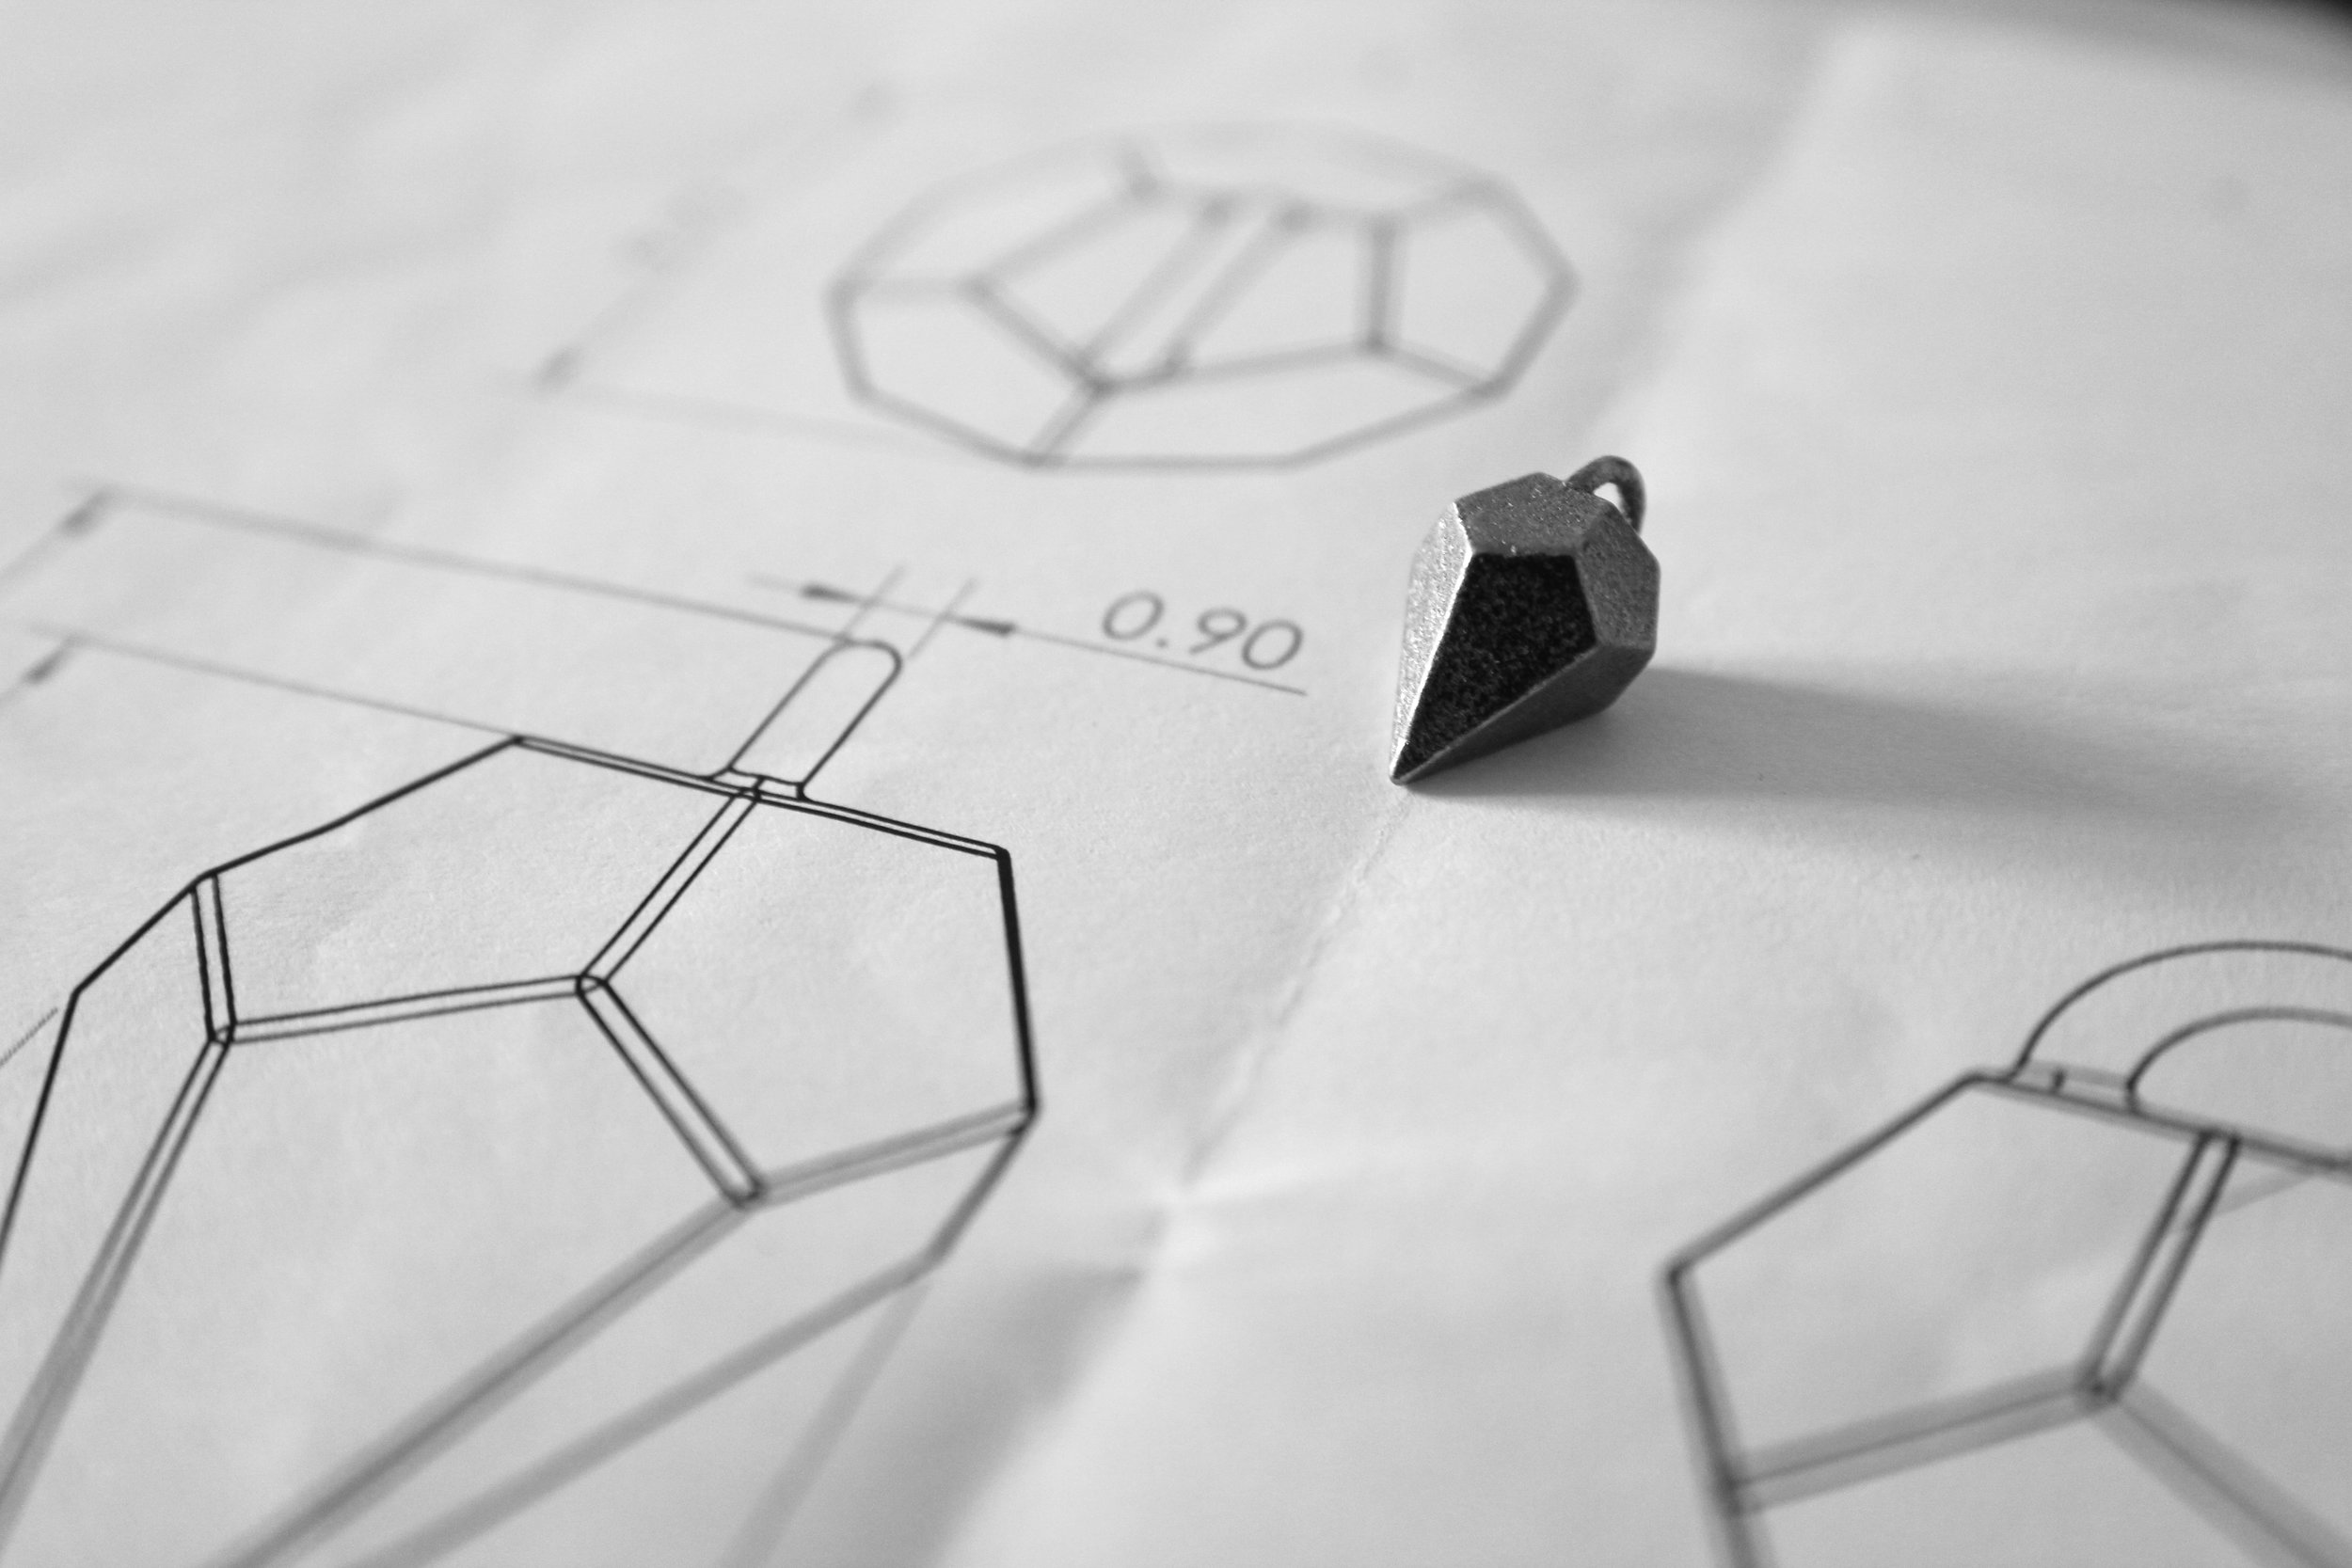 Dagger 3D Printed Steel Prototype, 2016